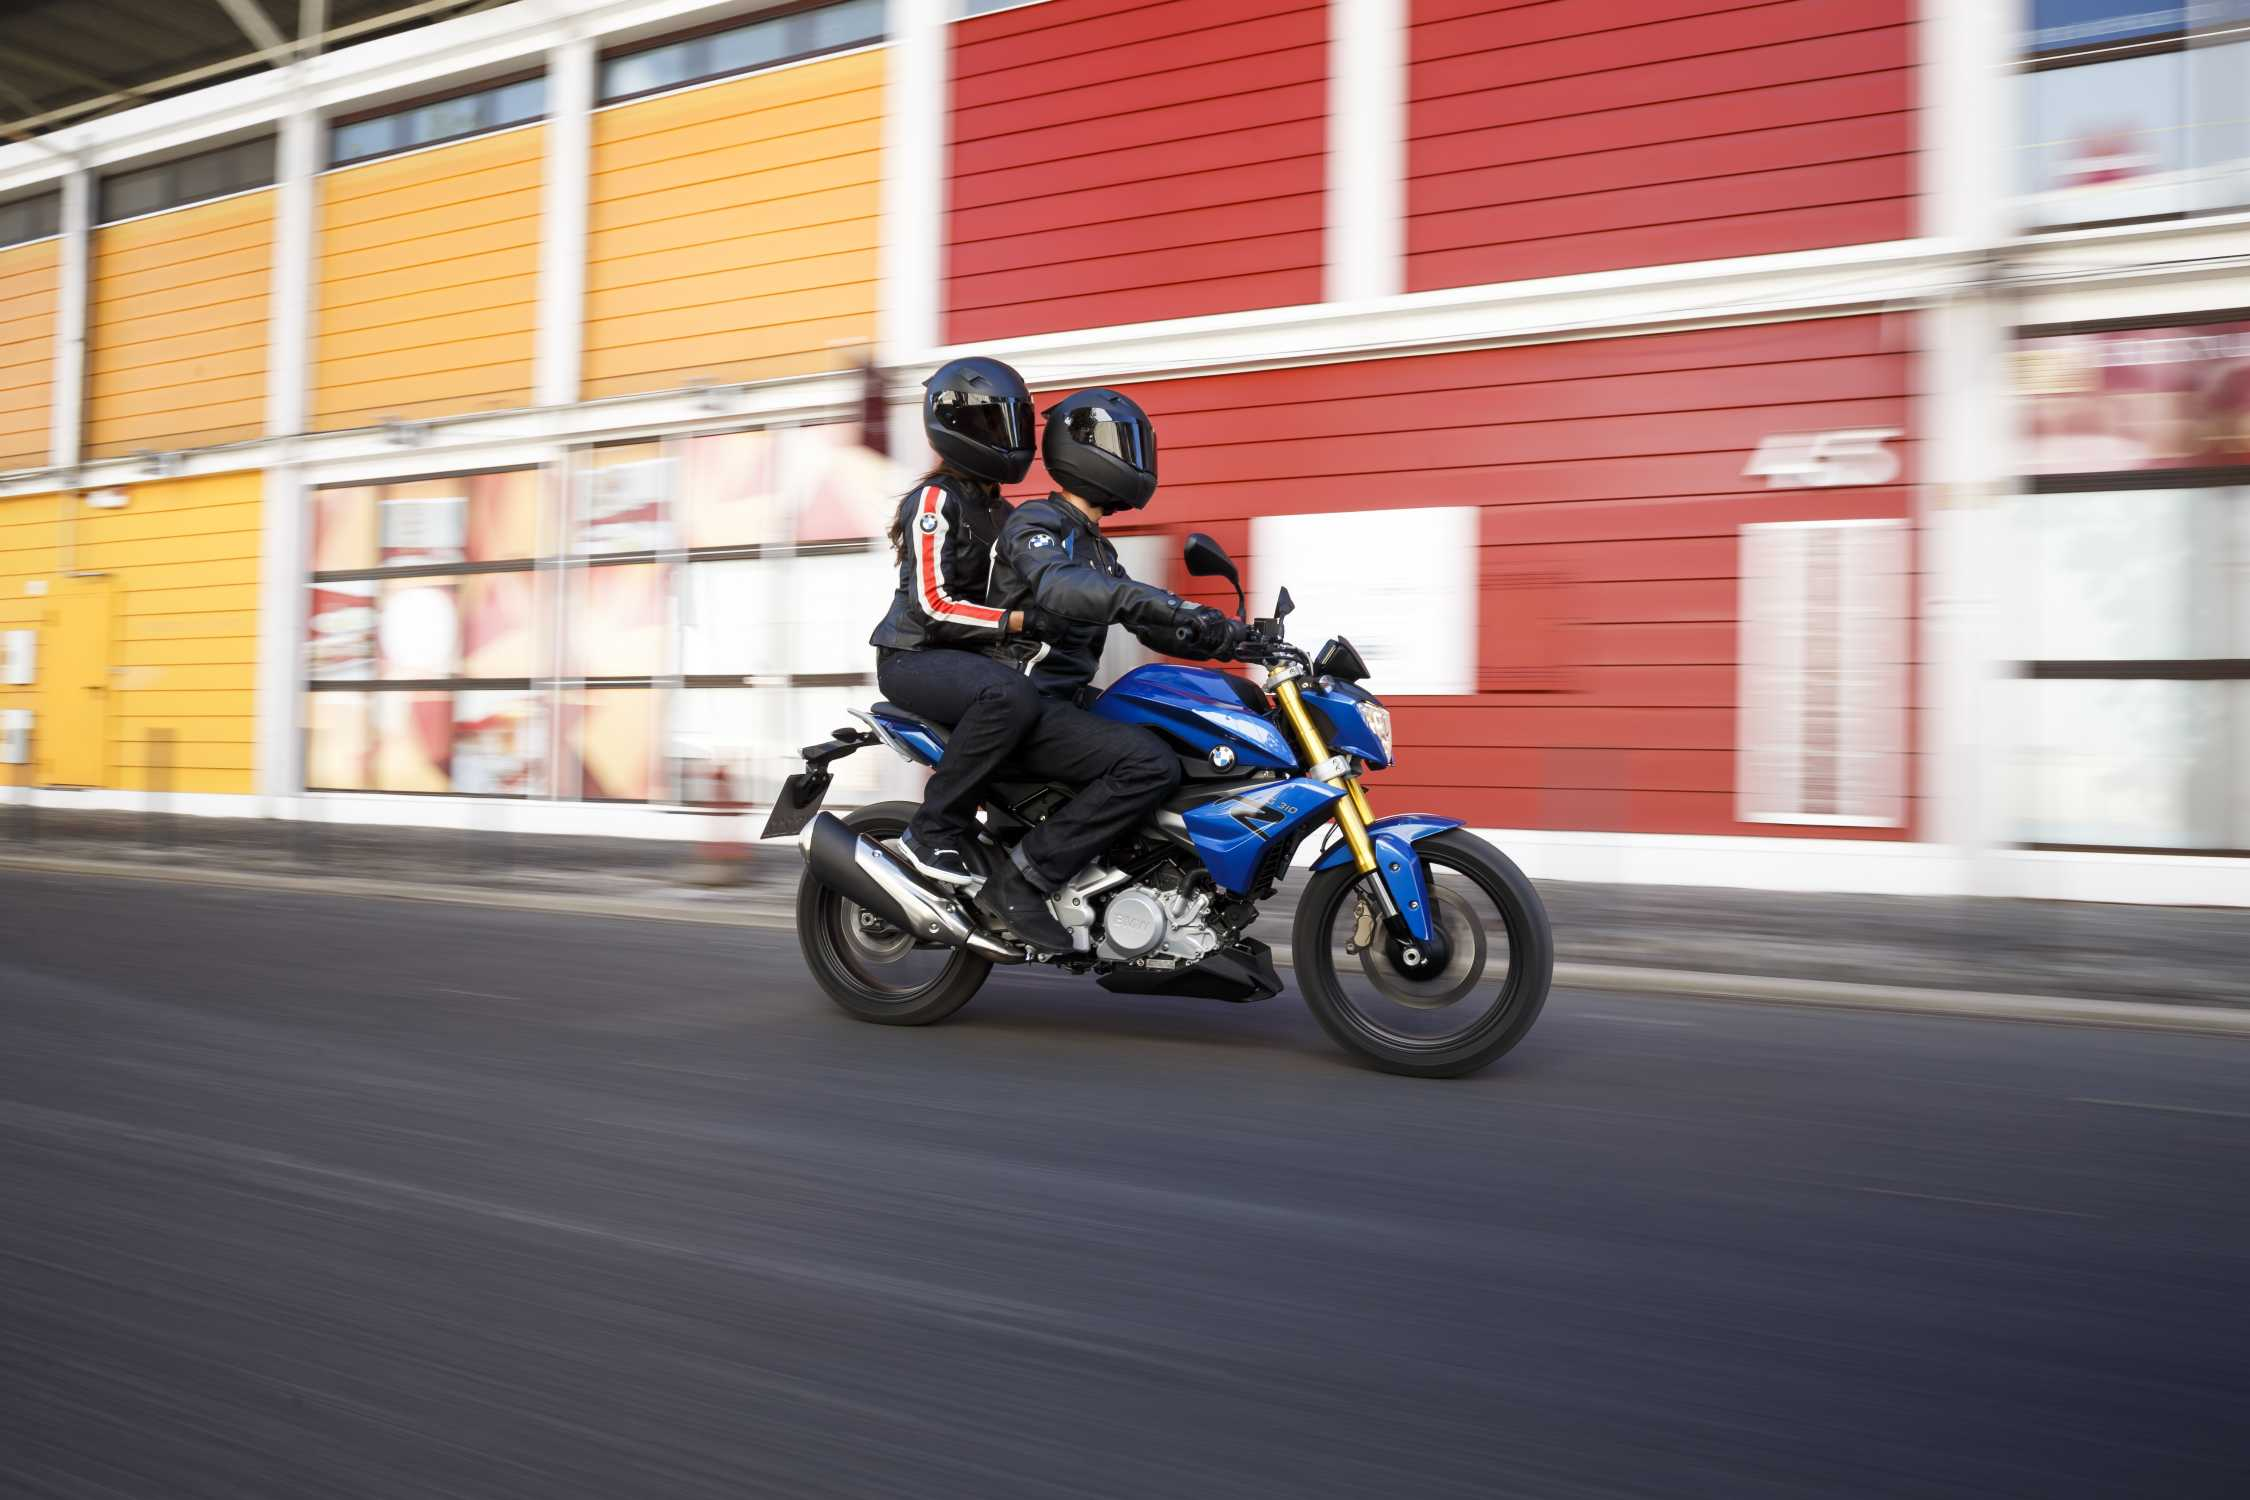 Мотоцикл BMW g 310 r #10